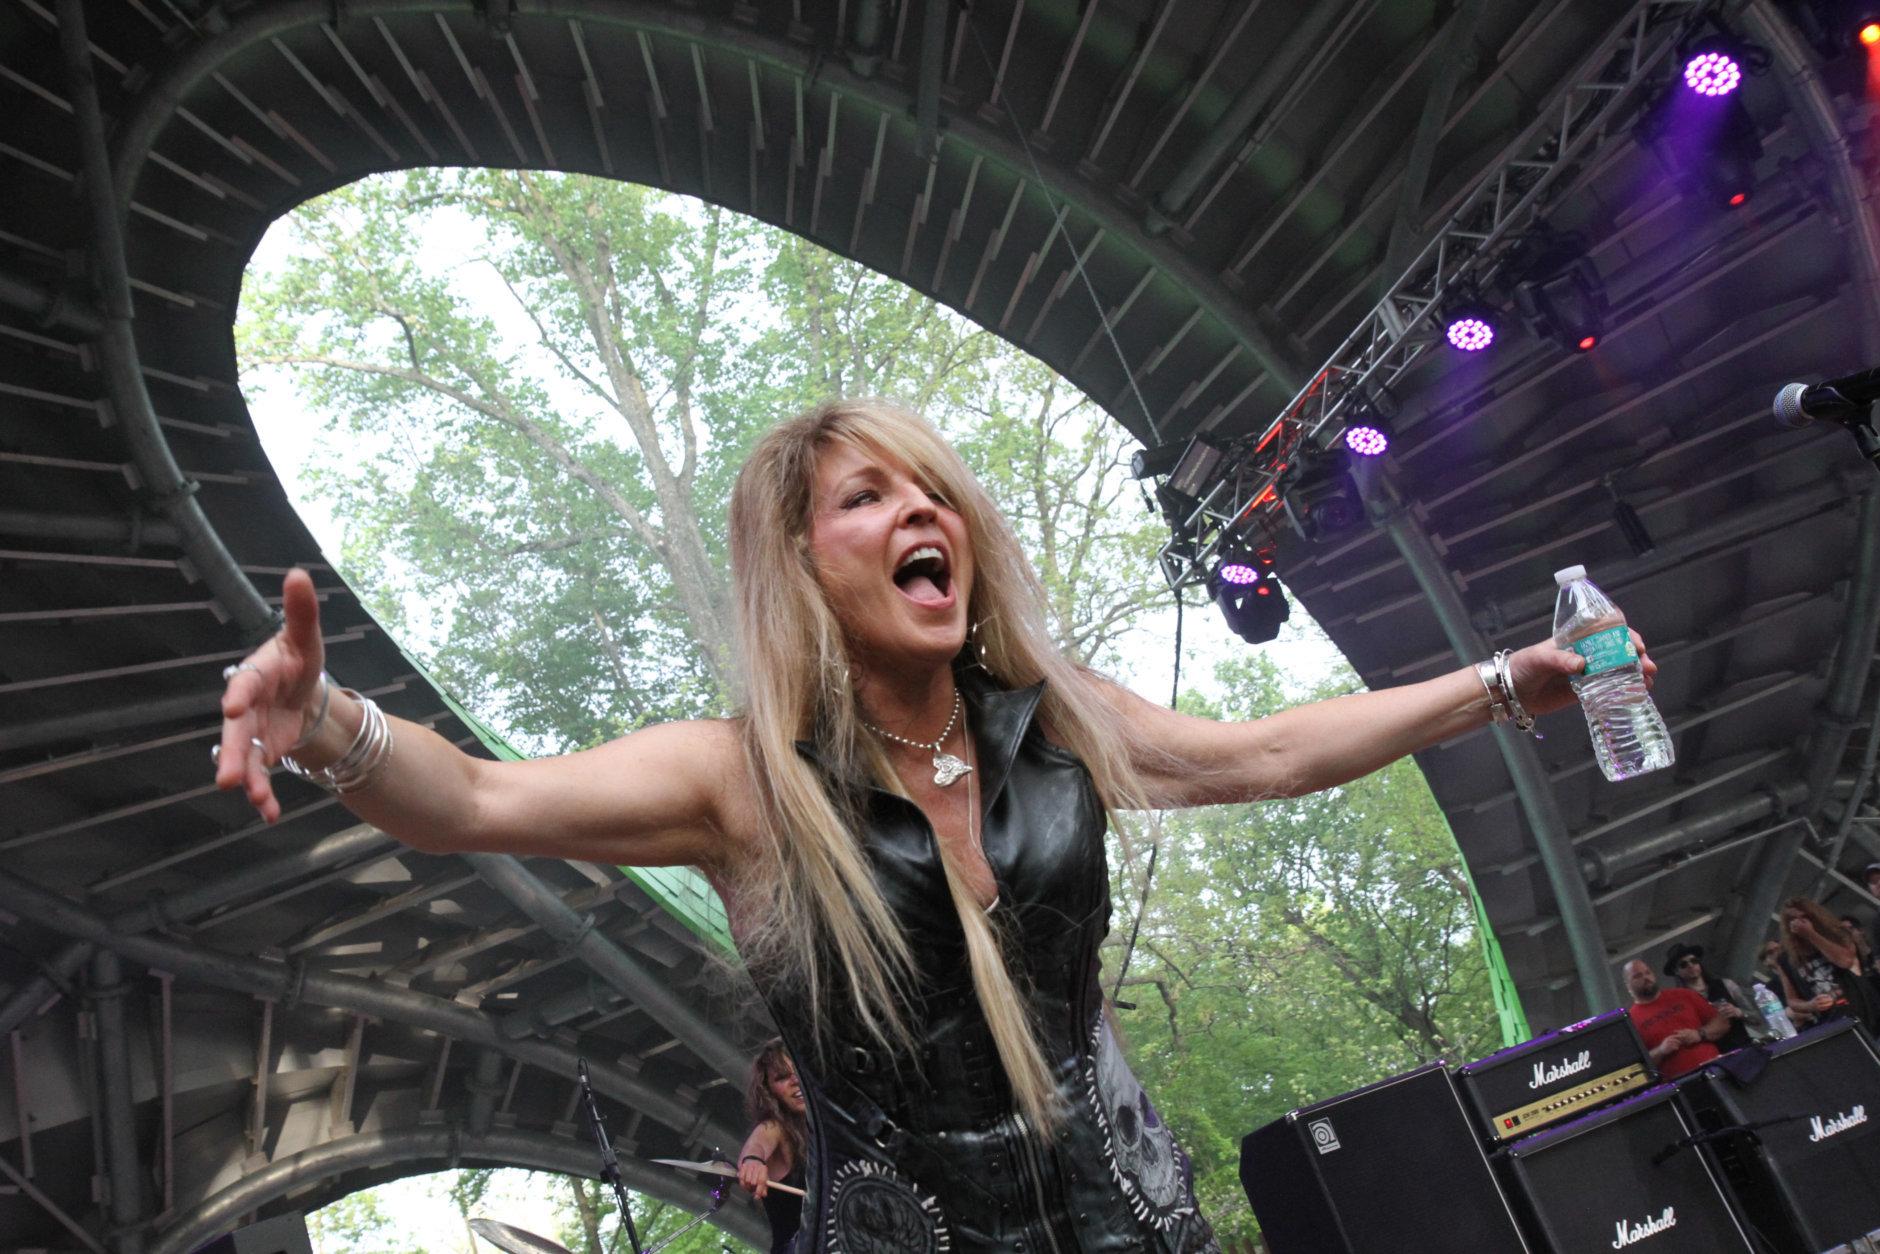 Vixen at M3 Rock Festival. (Dave Barnhouser/13th Hour Photography)